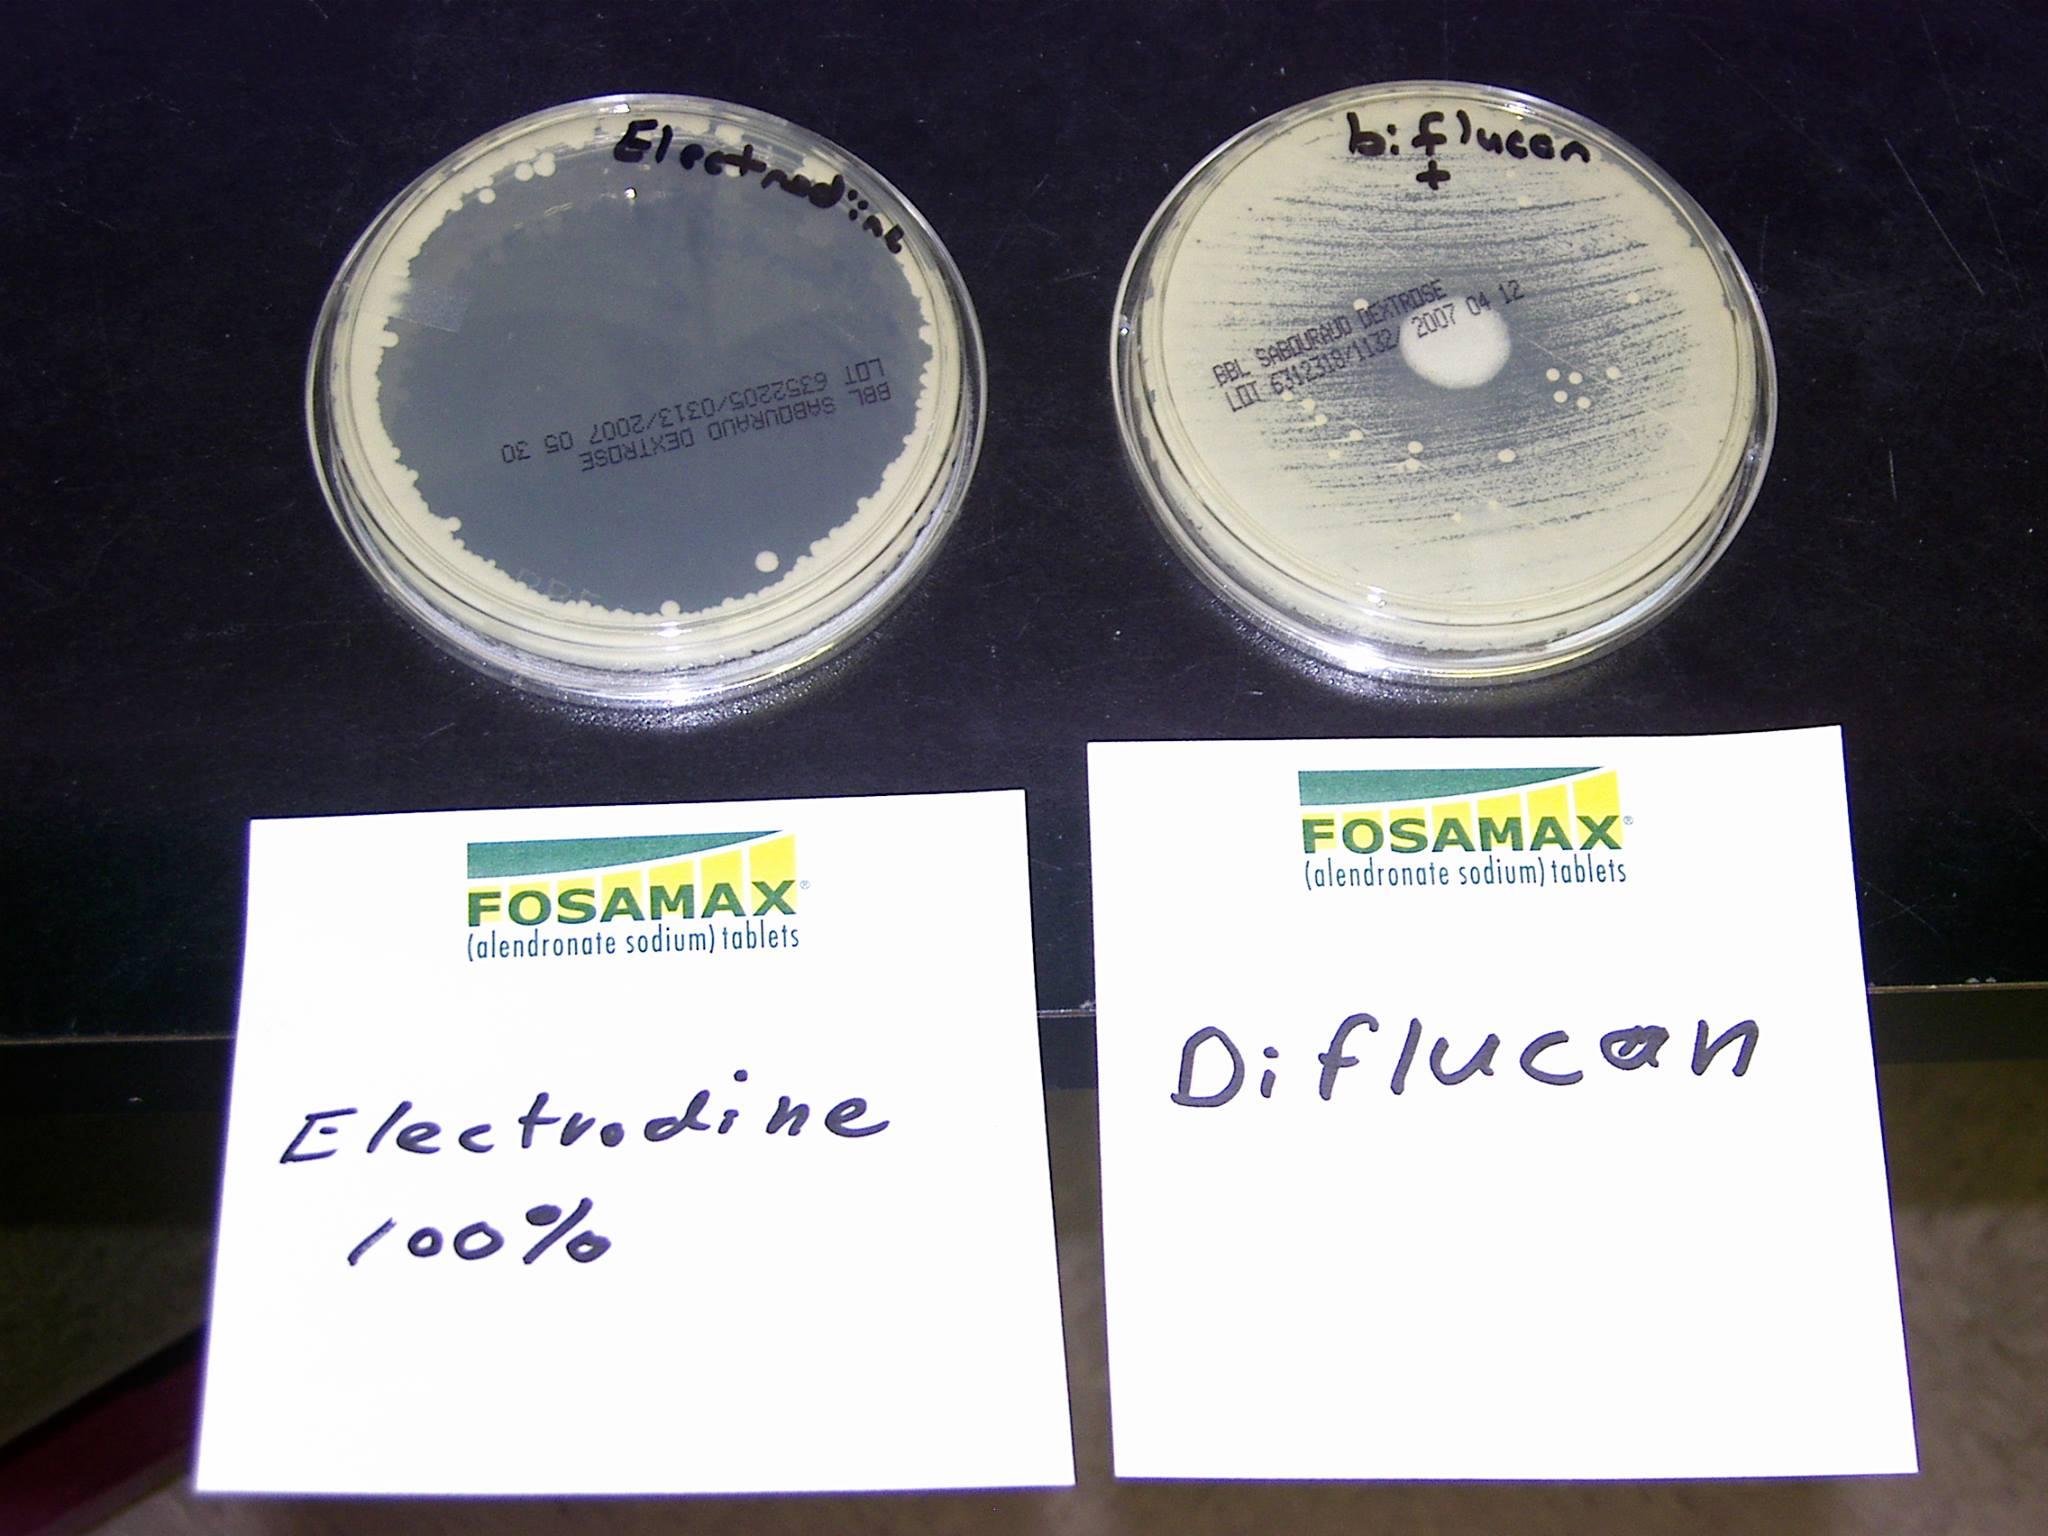 Petri – Electrodine vs Diflucan